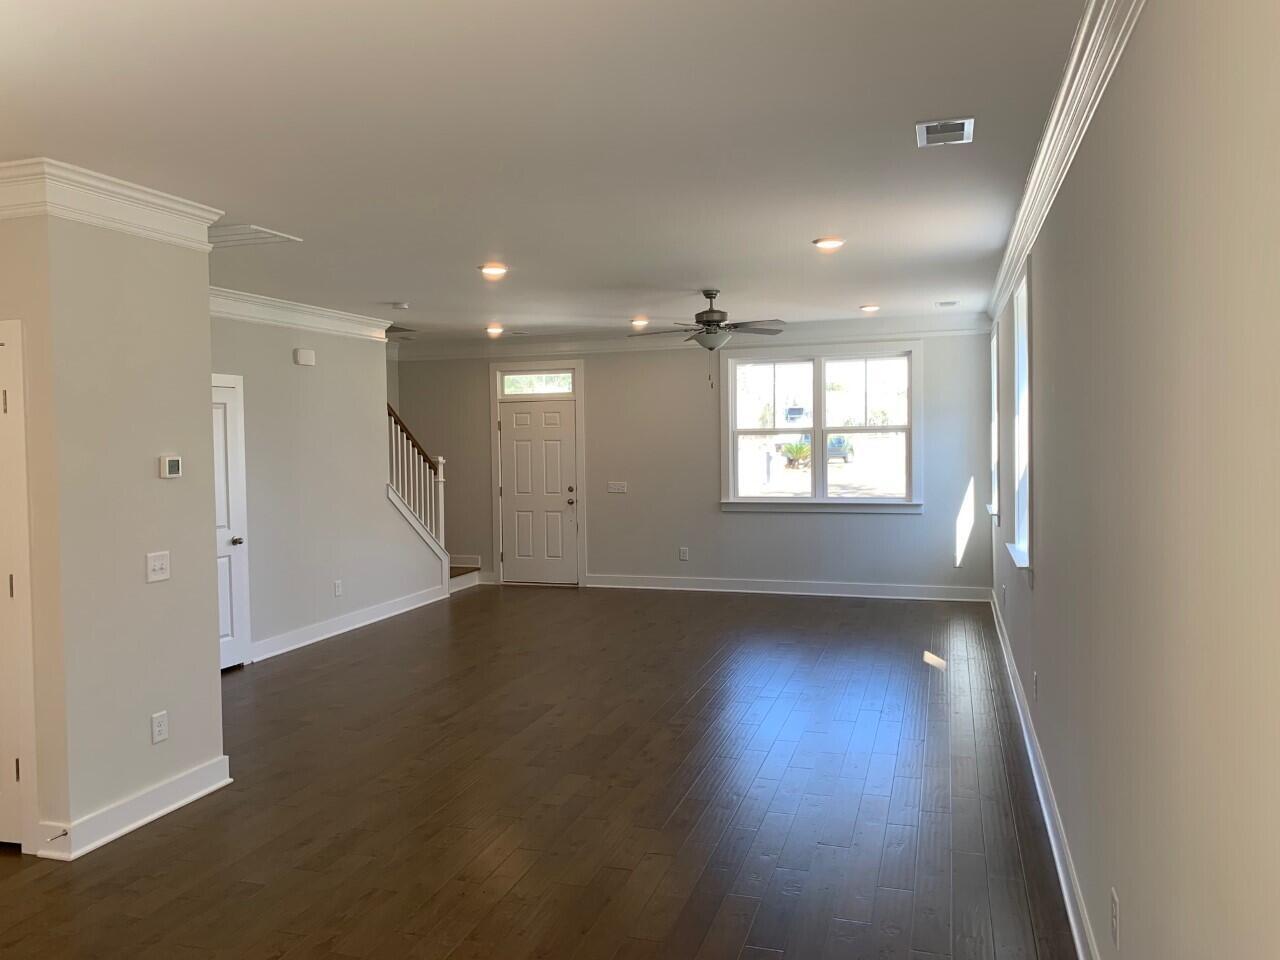 None Homes For Sale - 1111 Lieben, Mount Pleasant, SC - 4